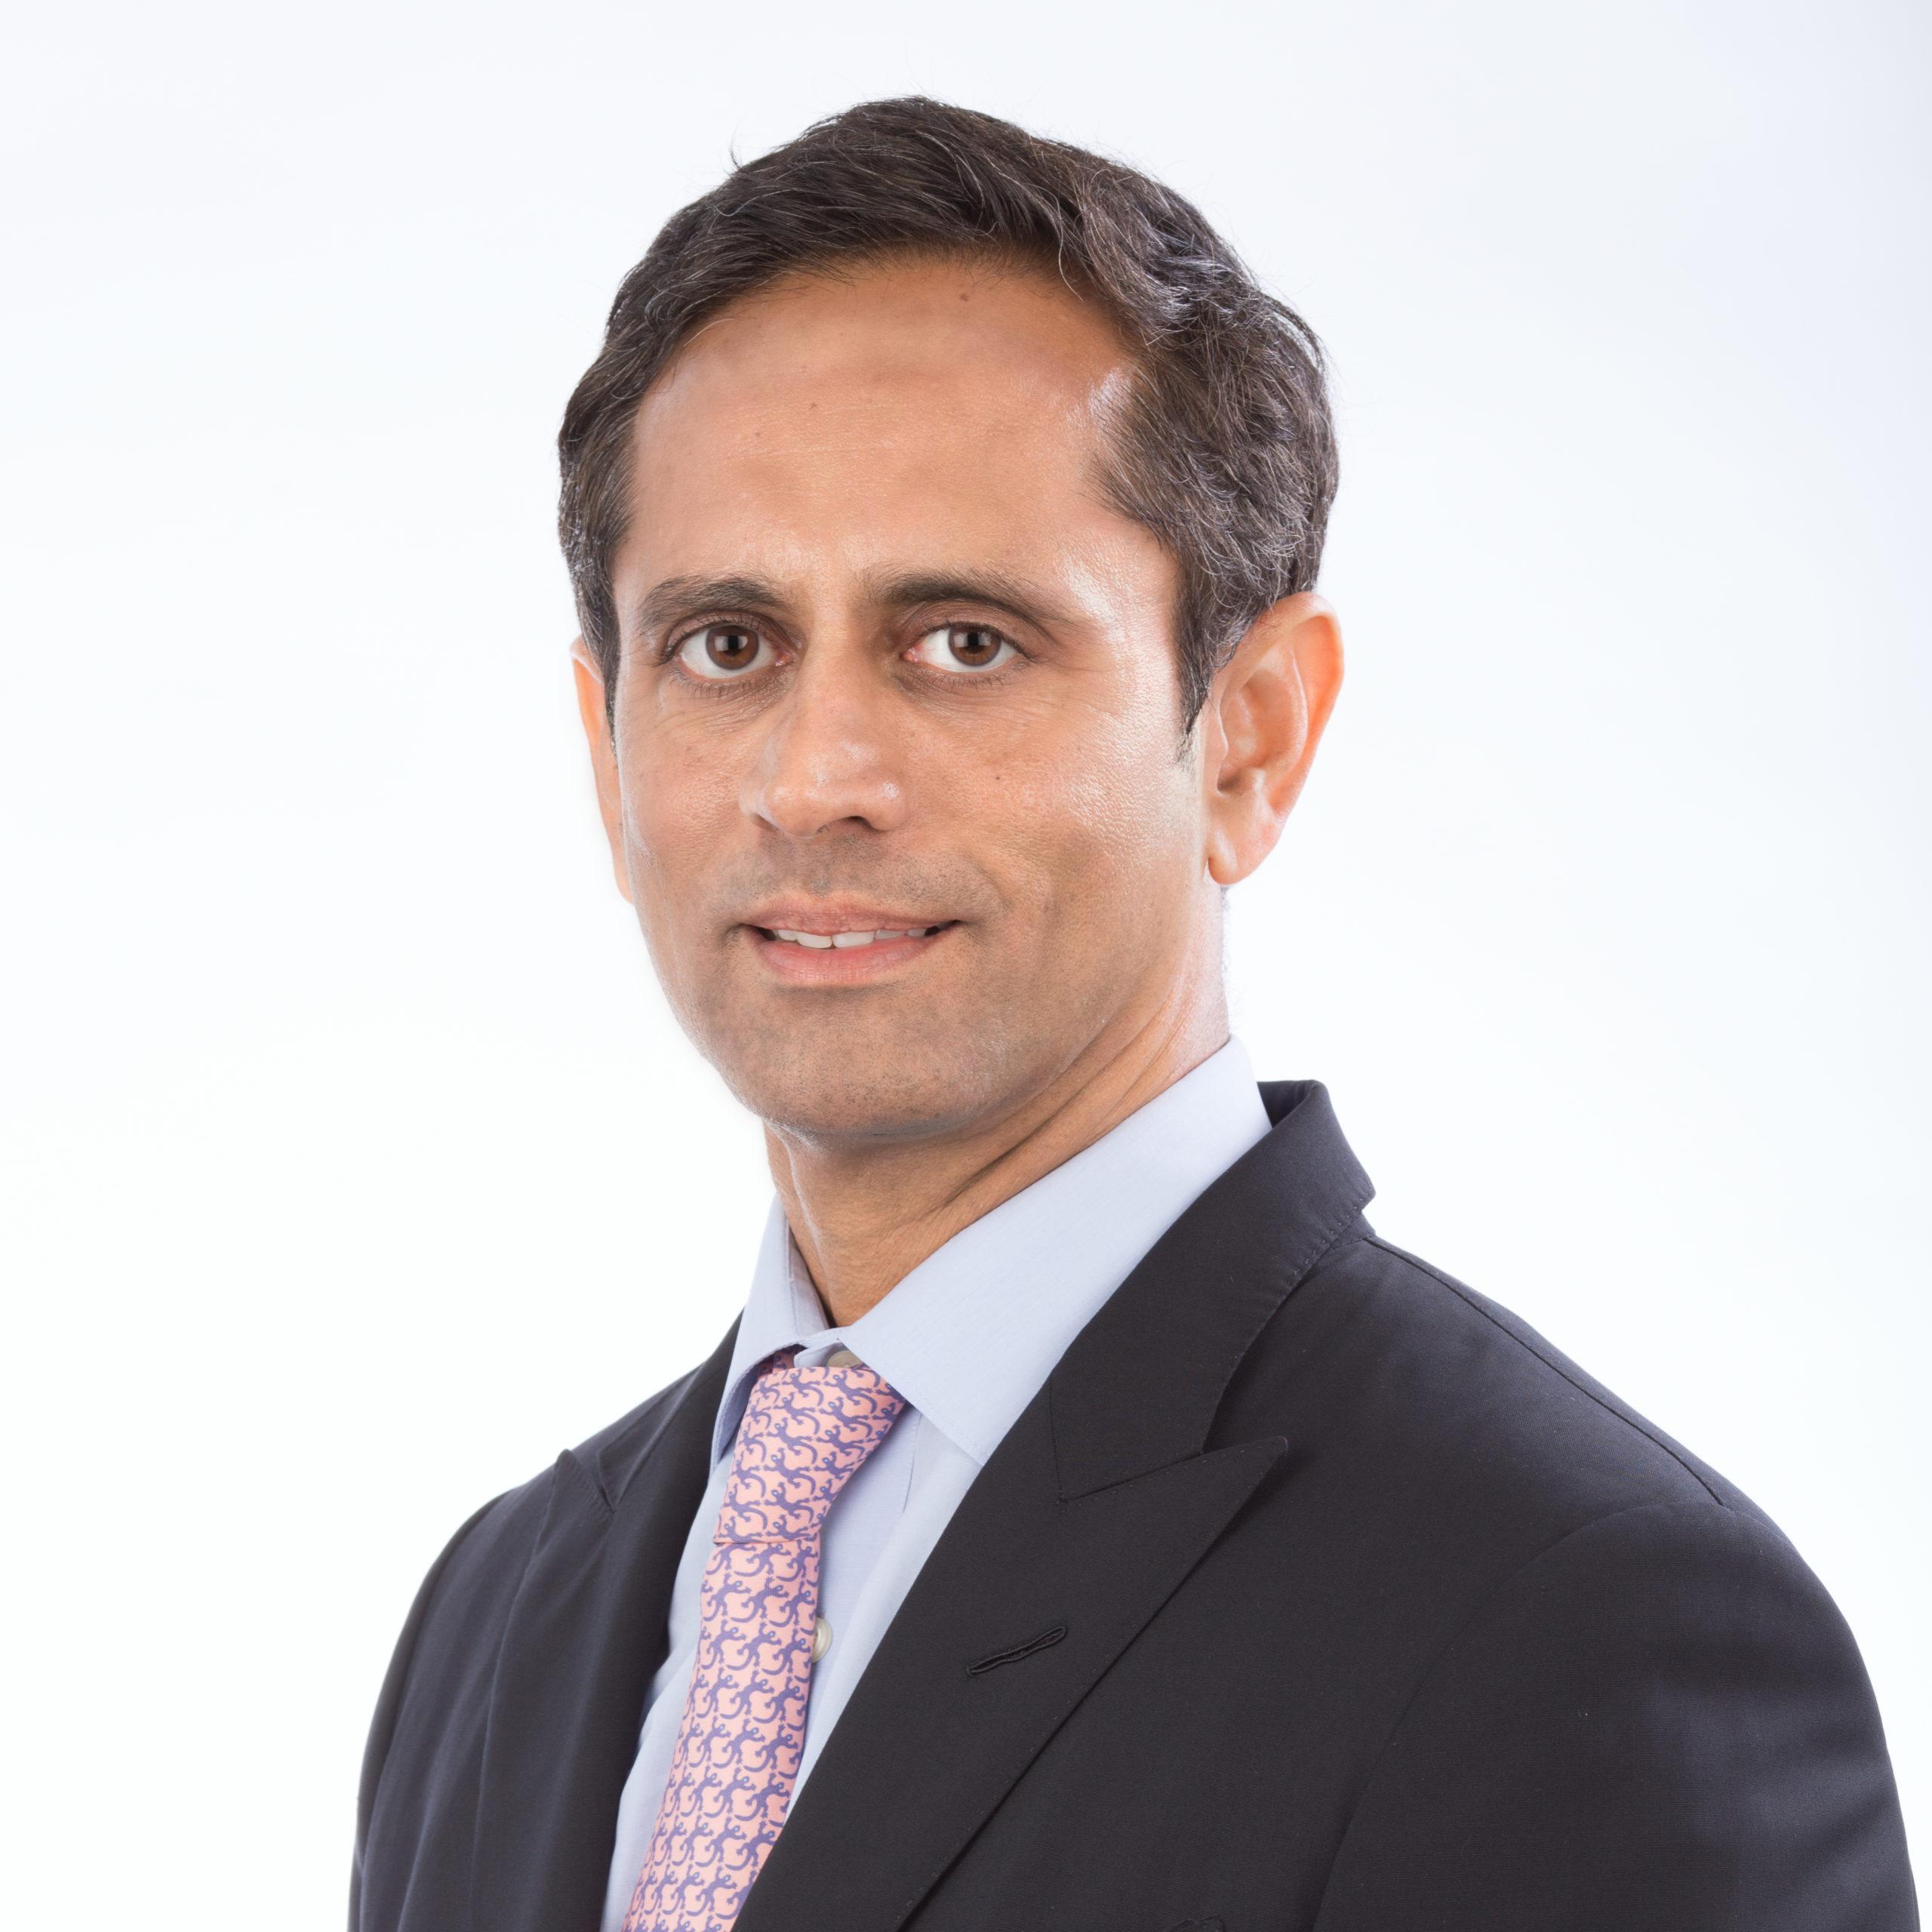 Vinod Kumar, Chief Executive Officer, Tata Communications